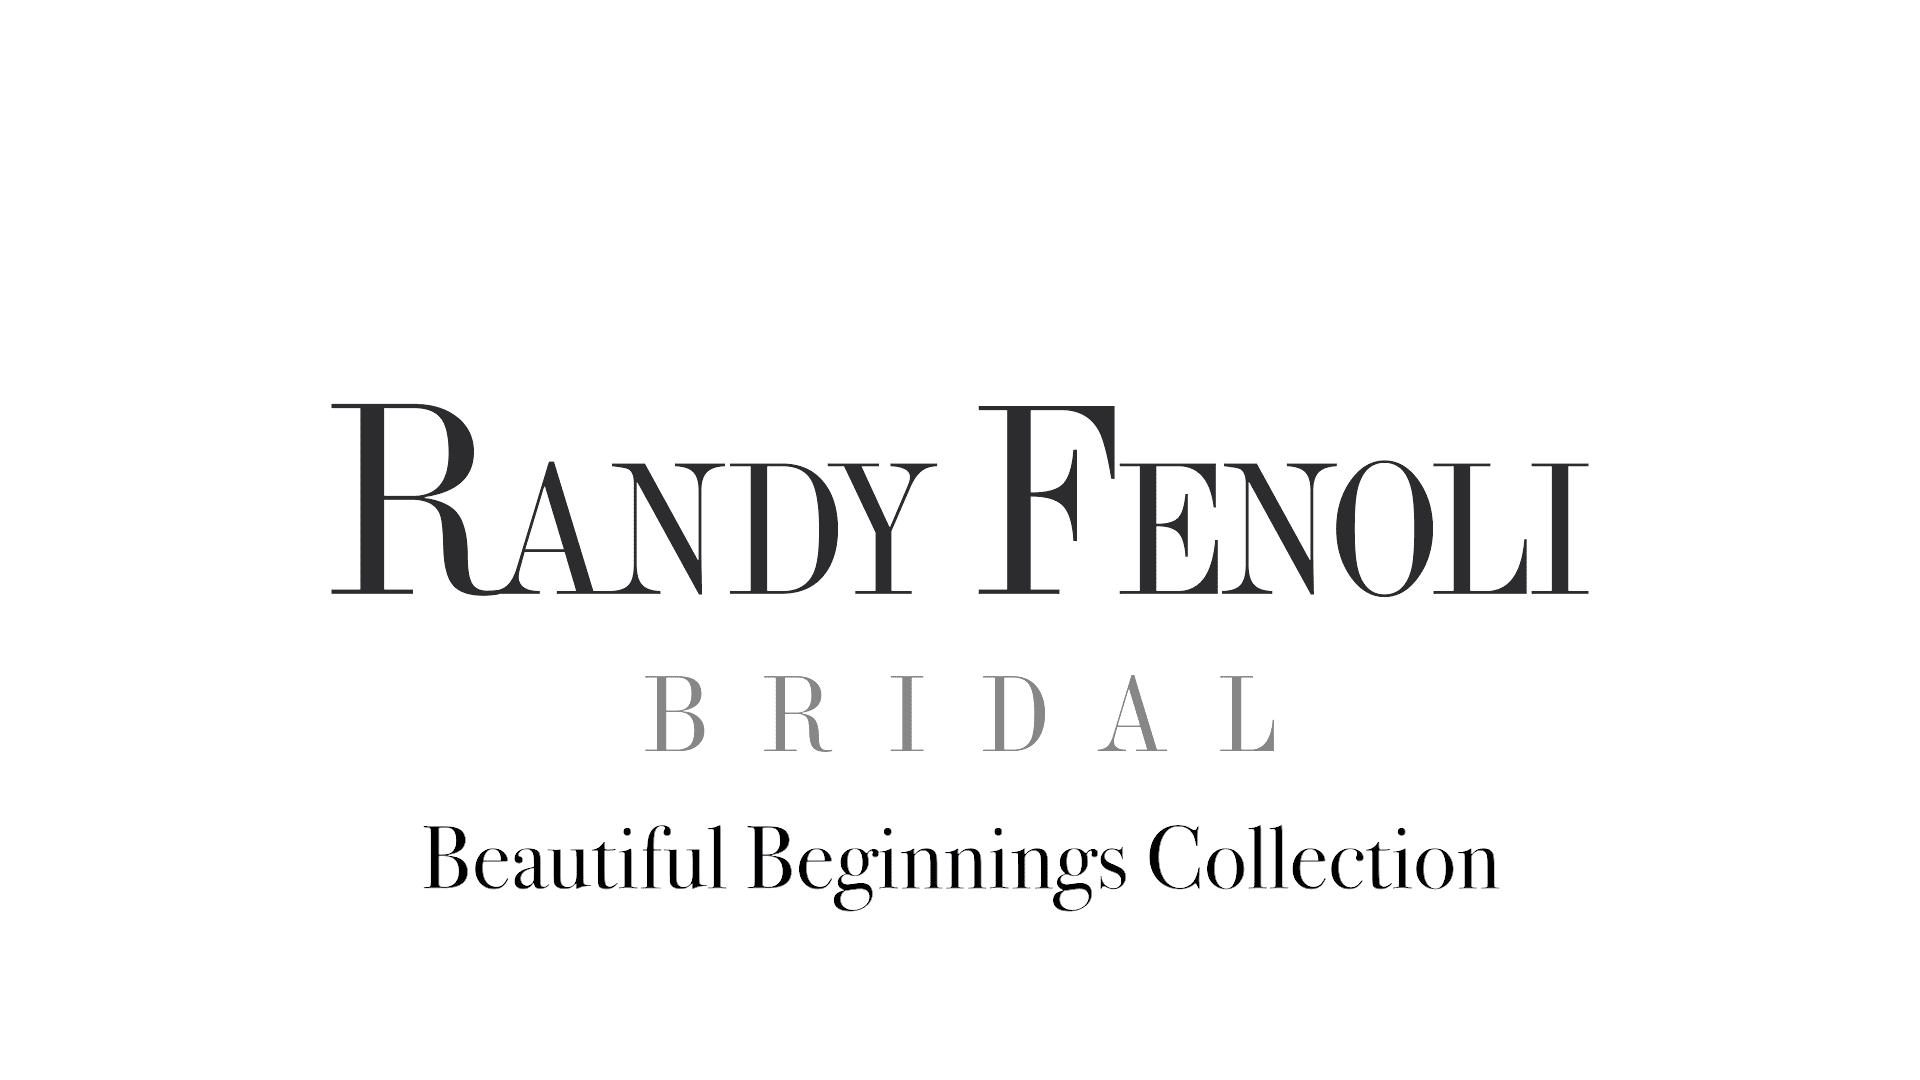 Randy Fenoli – Say yes to the dress @ Bridal Box